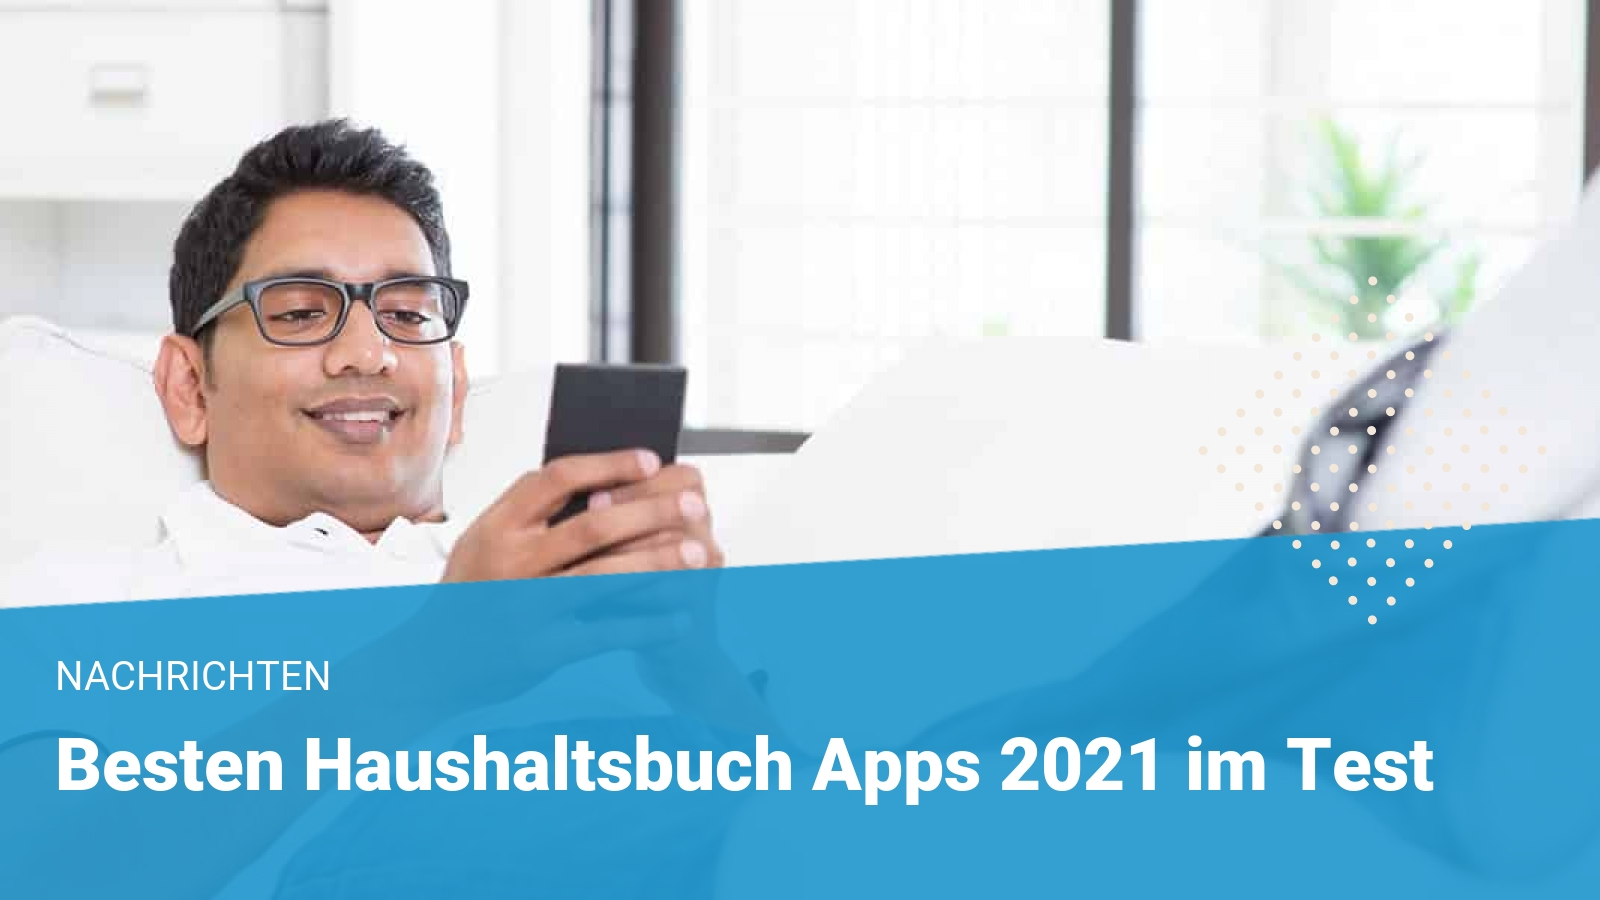 haushaltsbuch-apps-